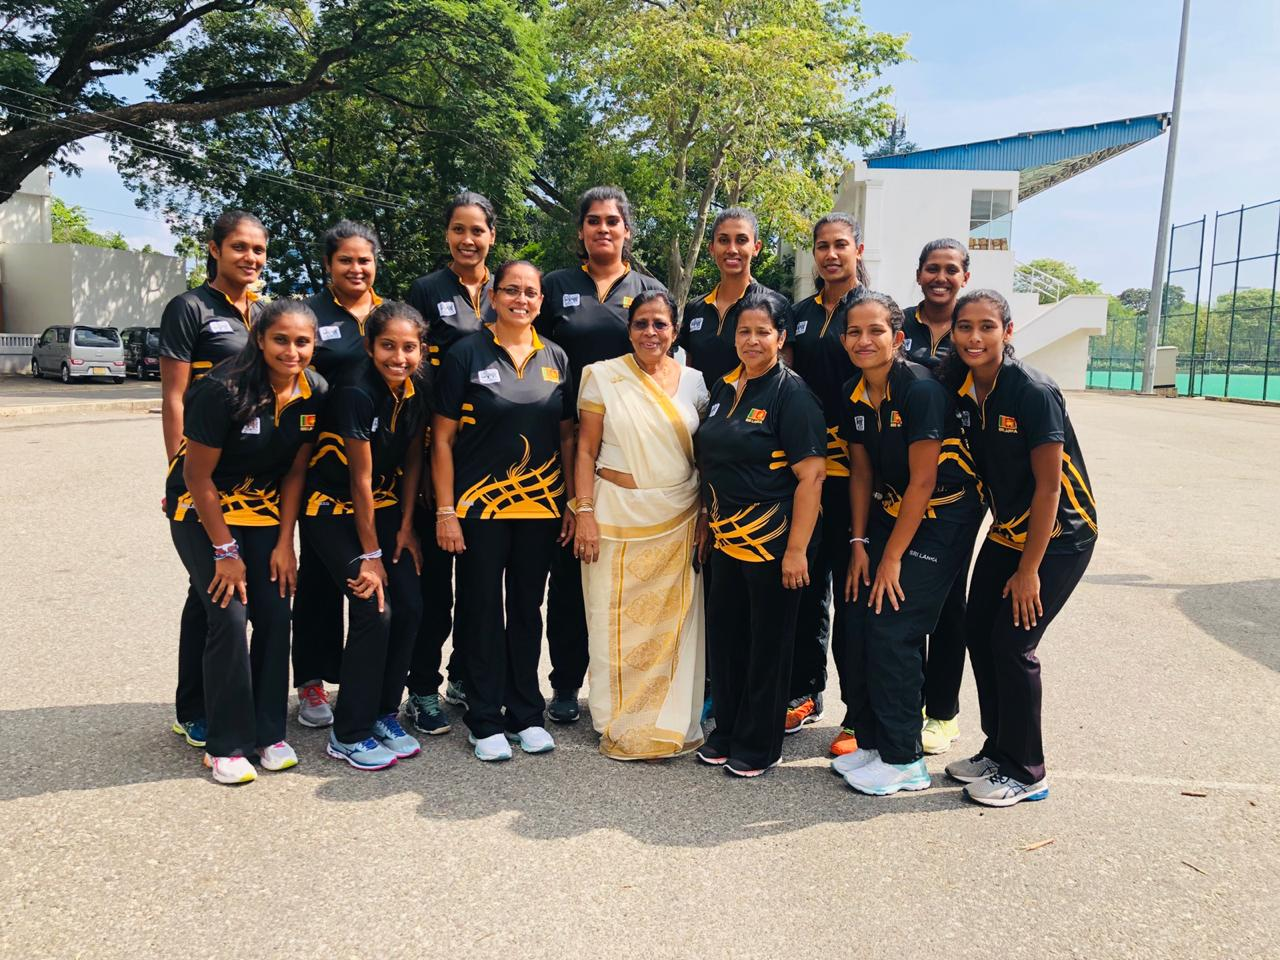 Sri-Lanka Netball tour of Botswana 2019